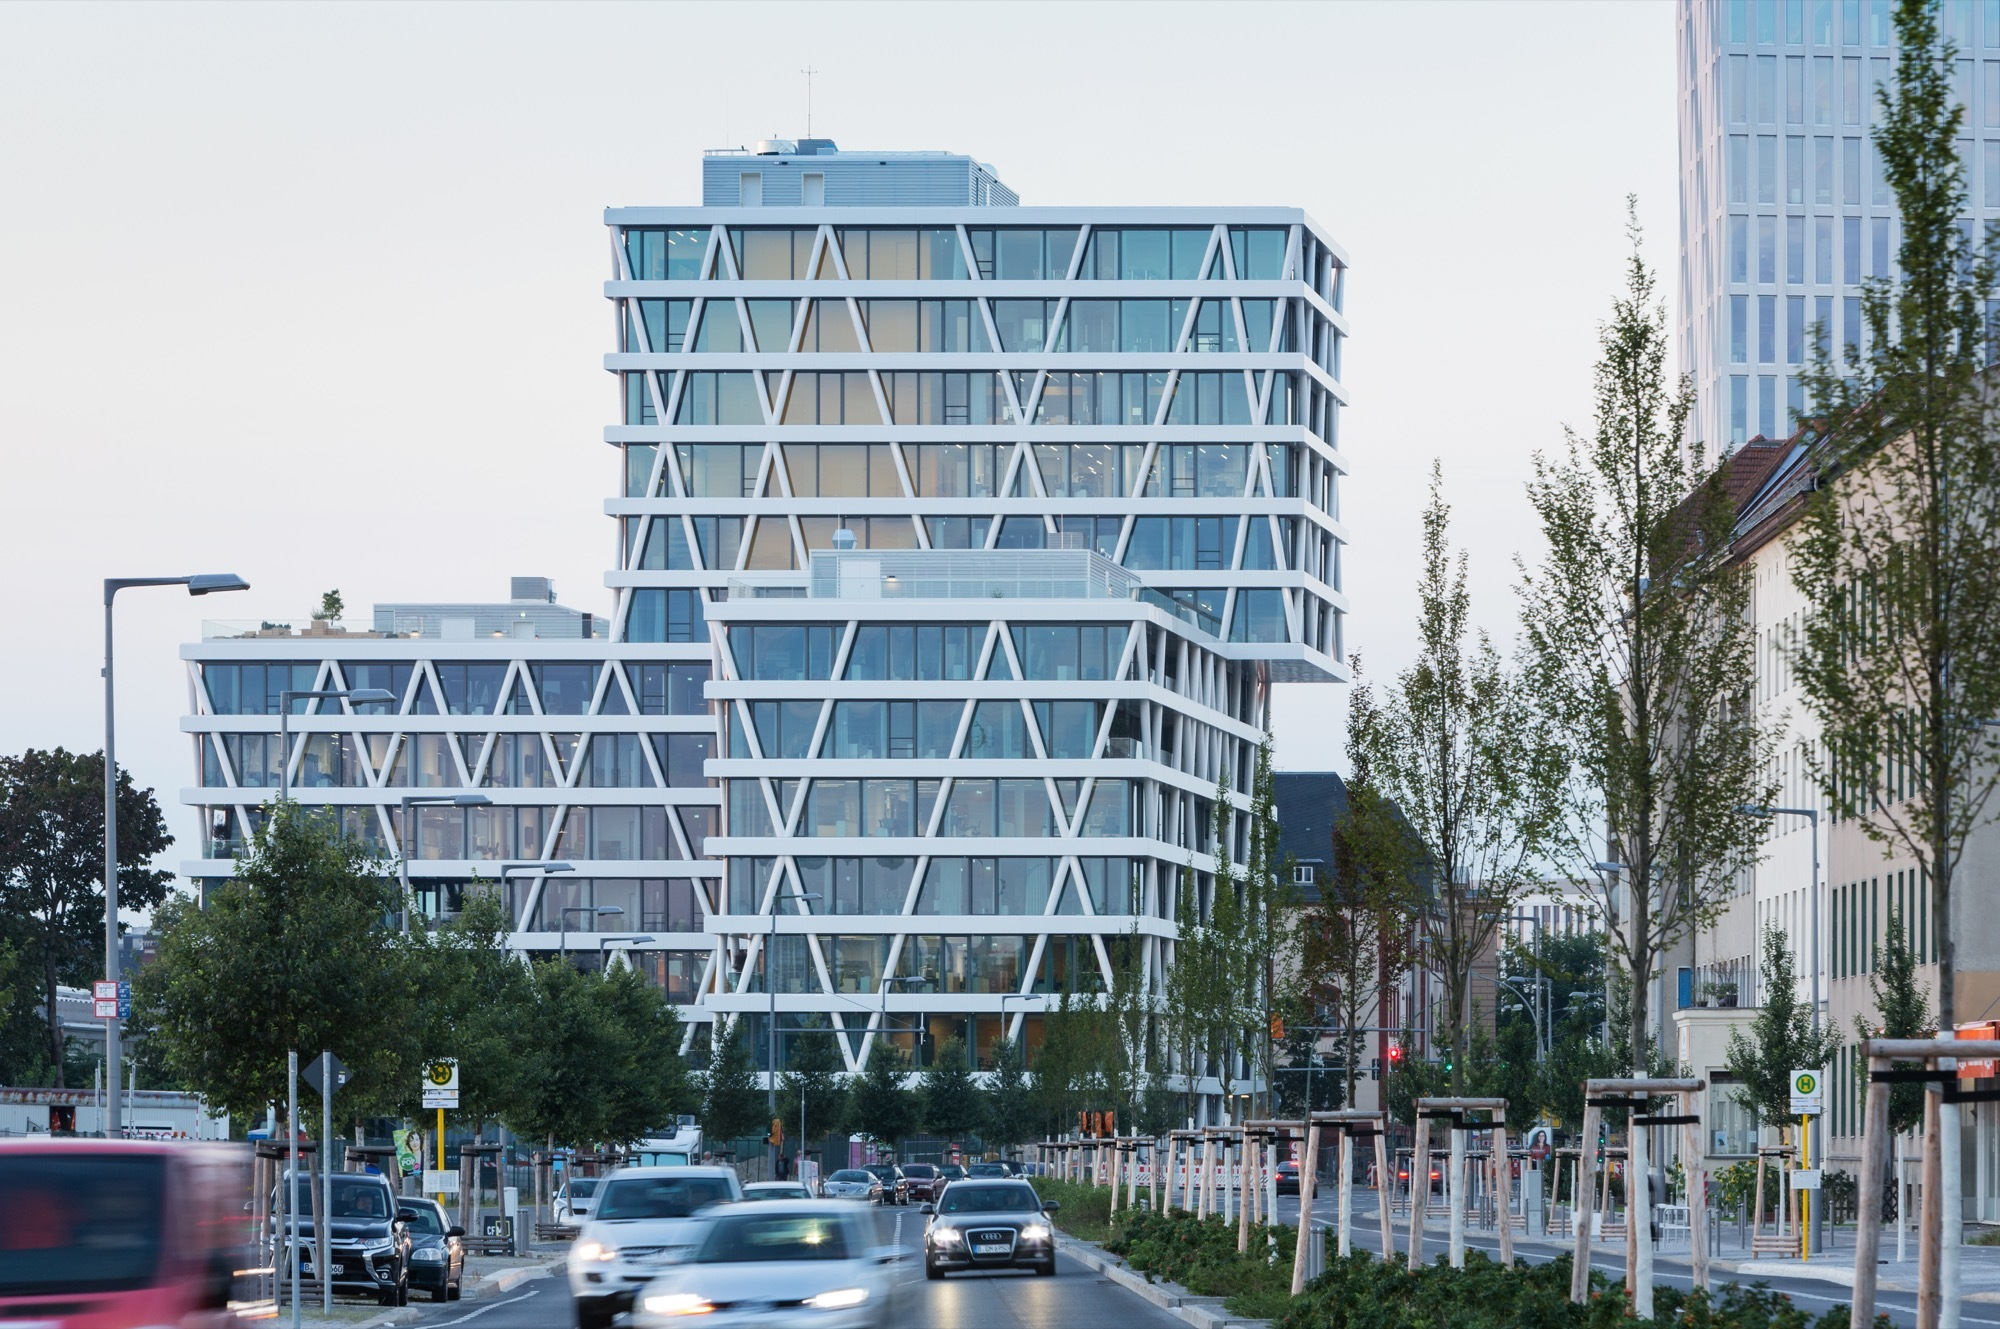 50hertz Headquarter Berlin Love Architecture And